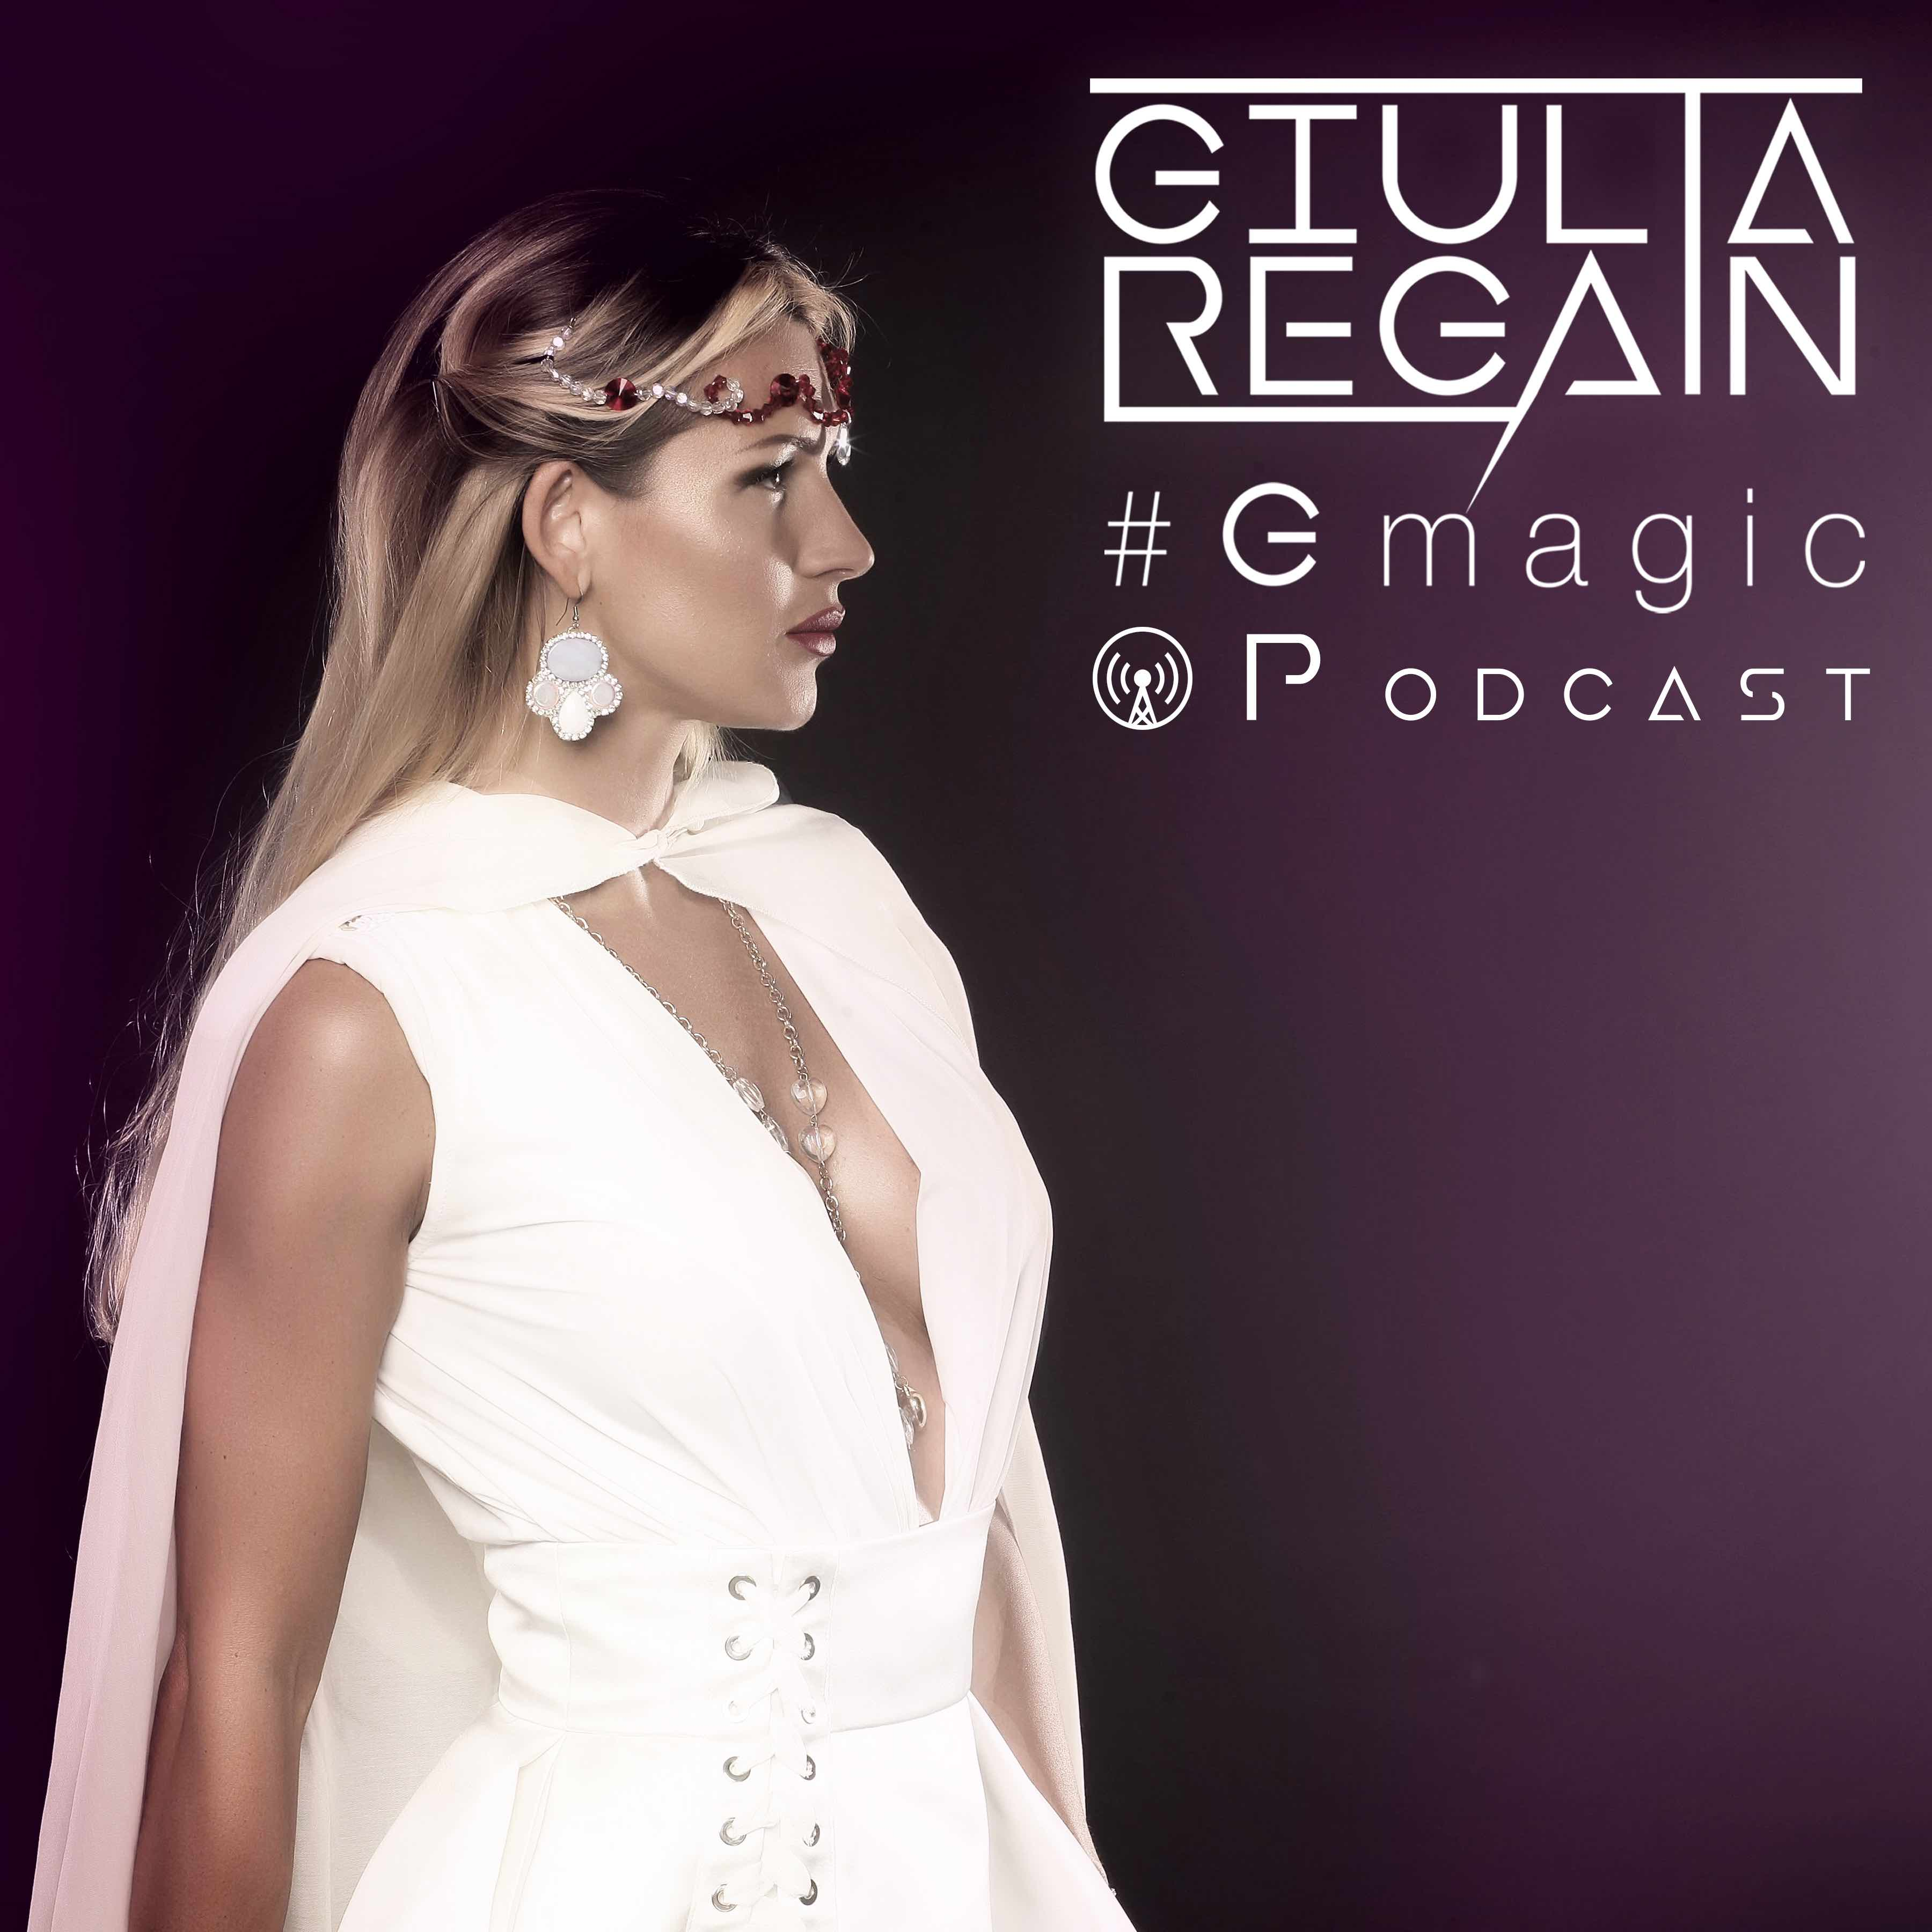 #Gmagic Podcast - Giulia Regain Official Radio Show